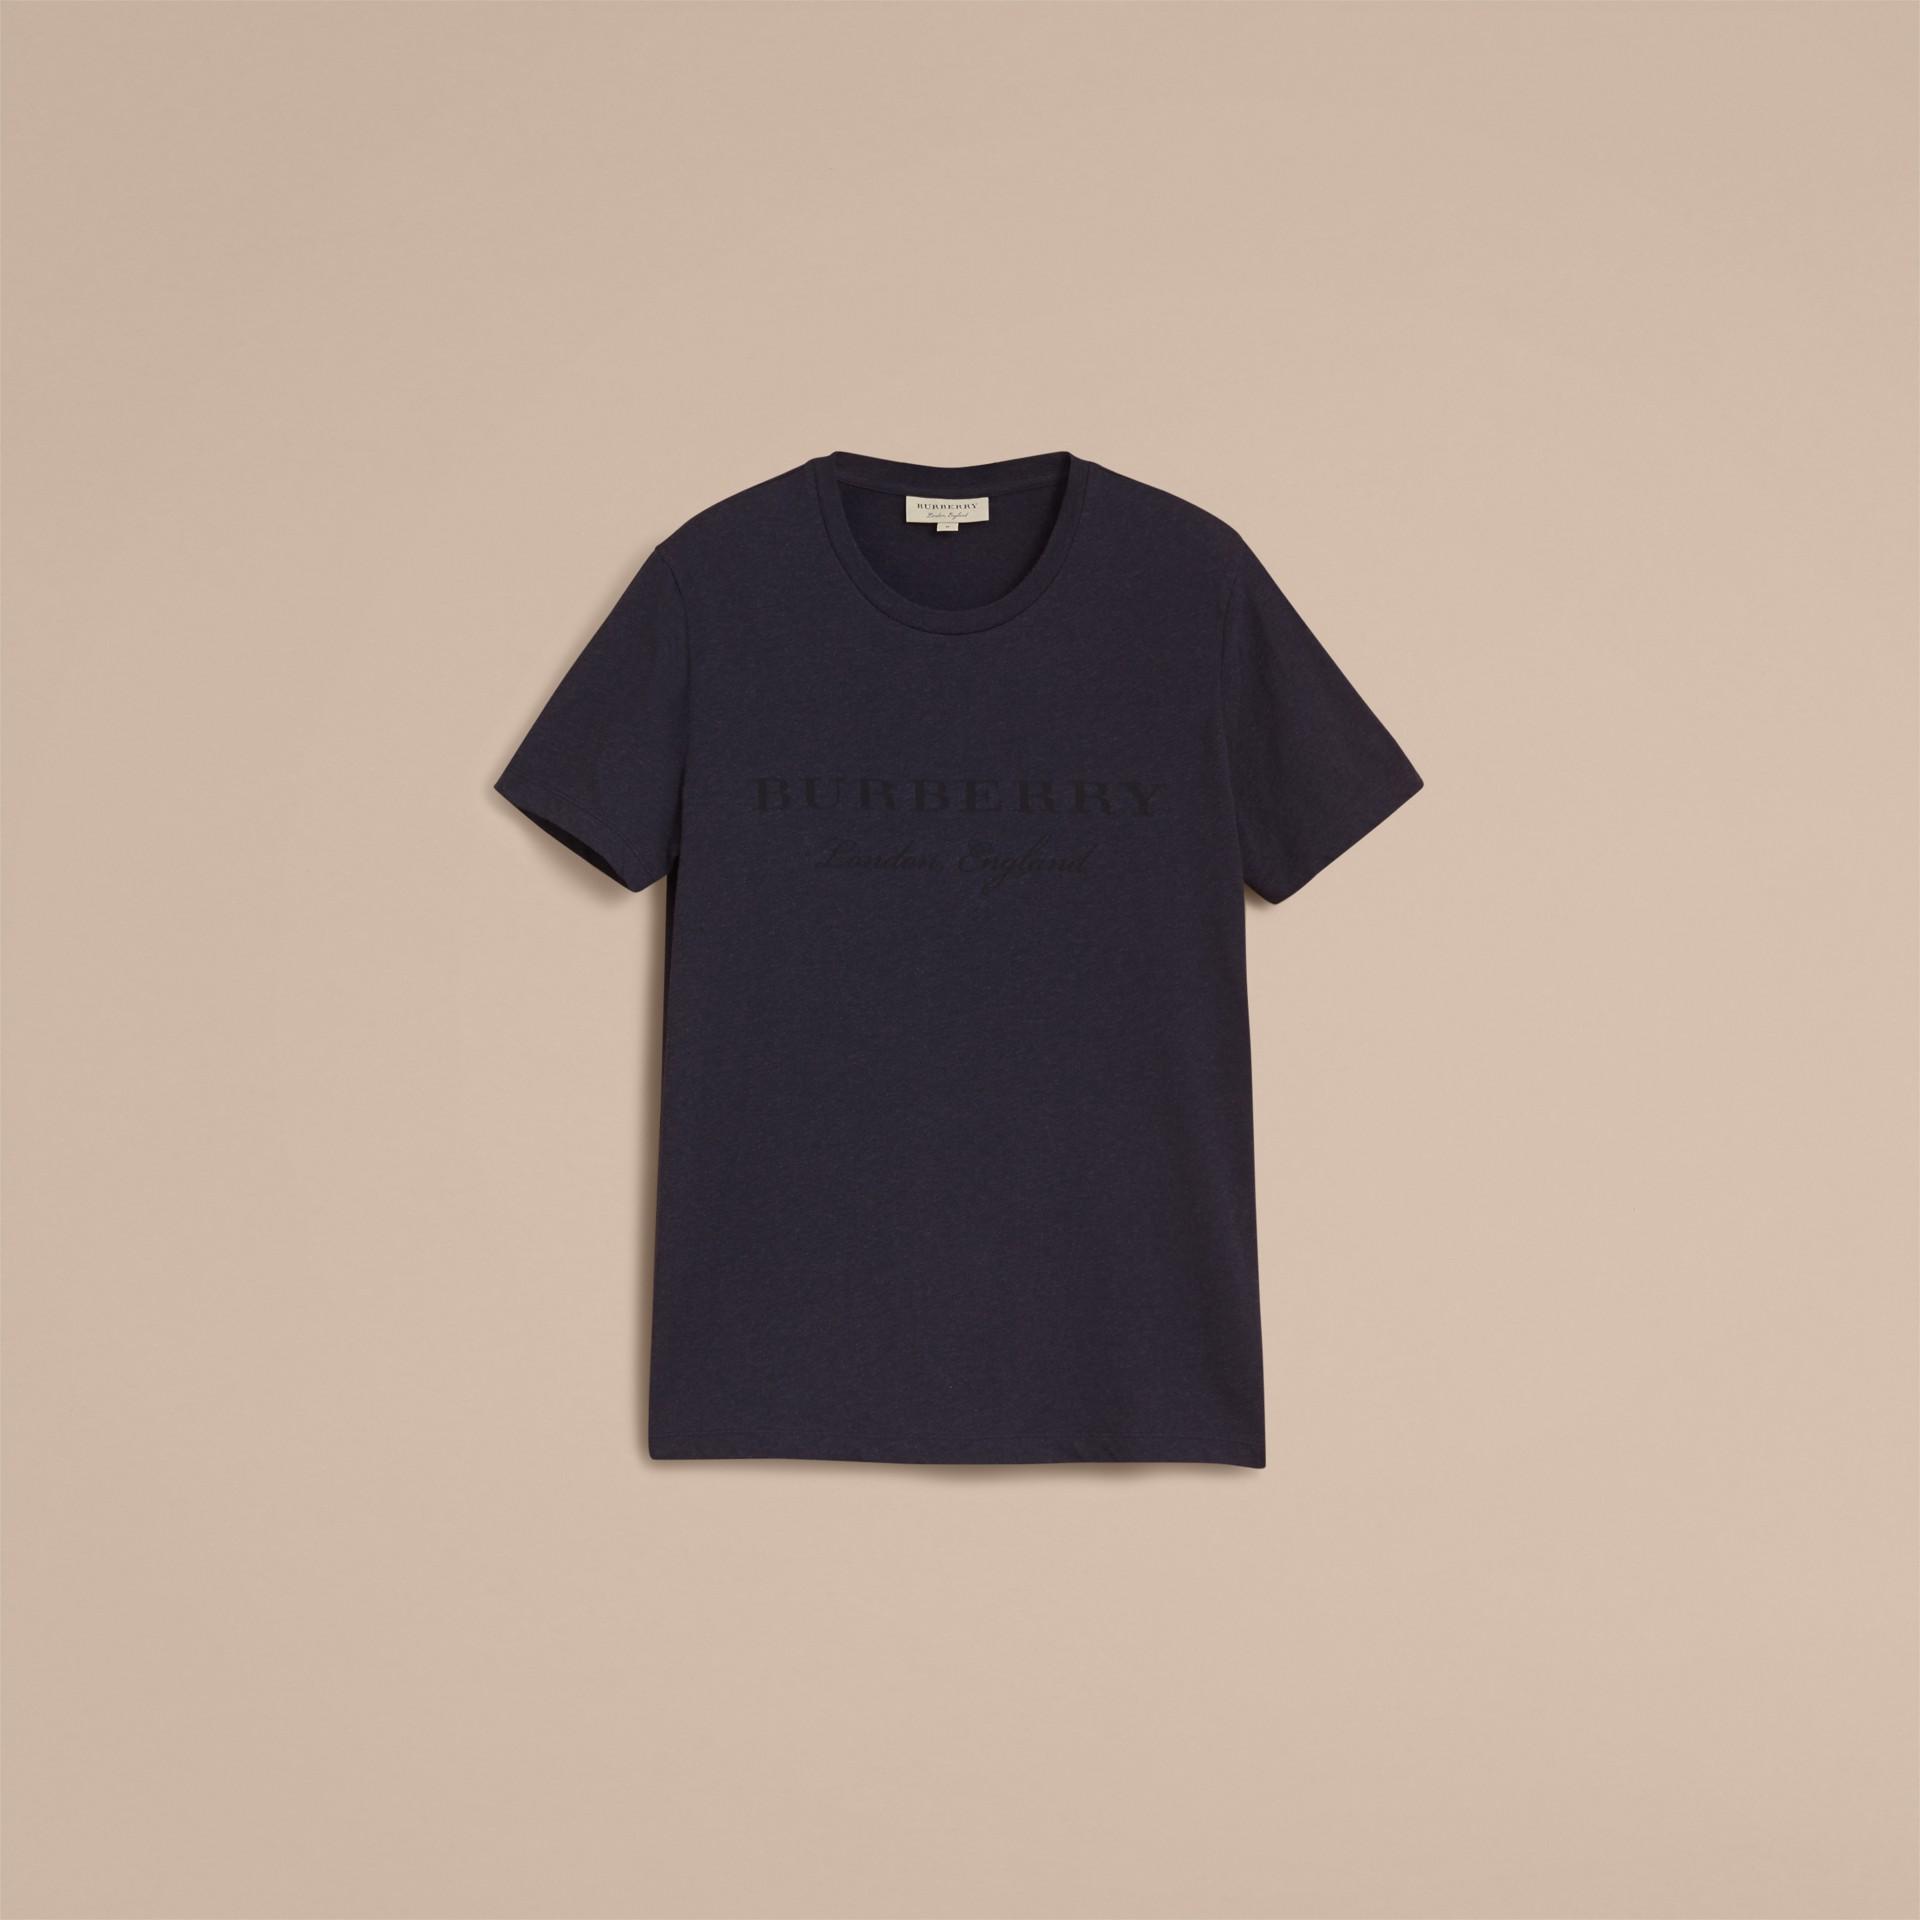 Contrast Motif Cotton Blend T-shirt Navy Melange - gallery image 4